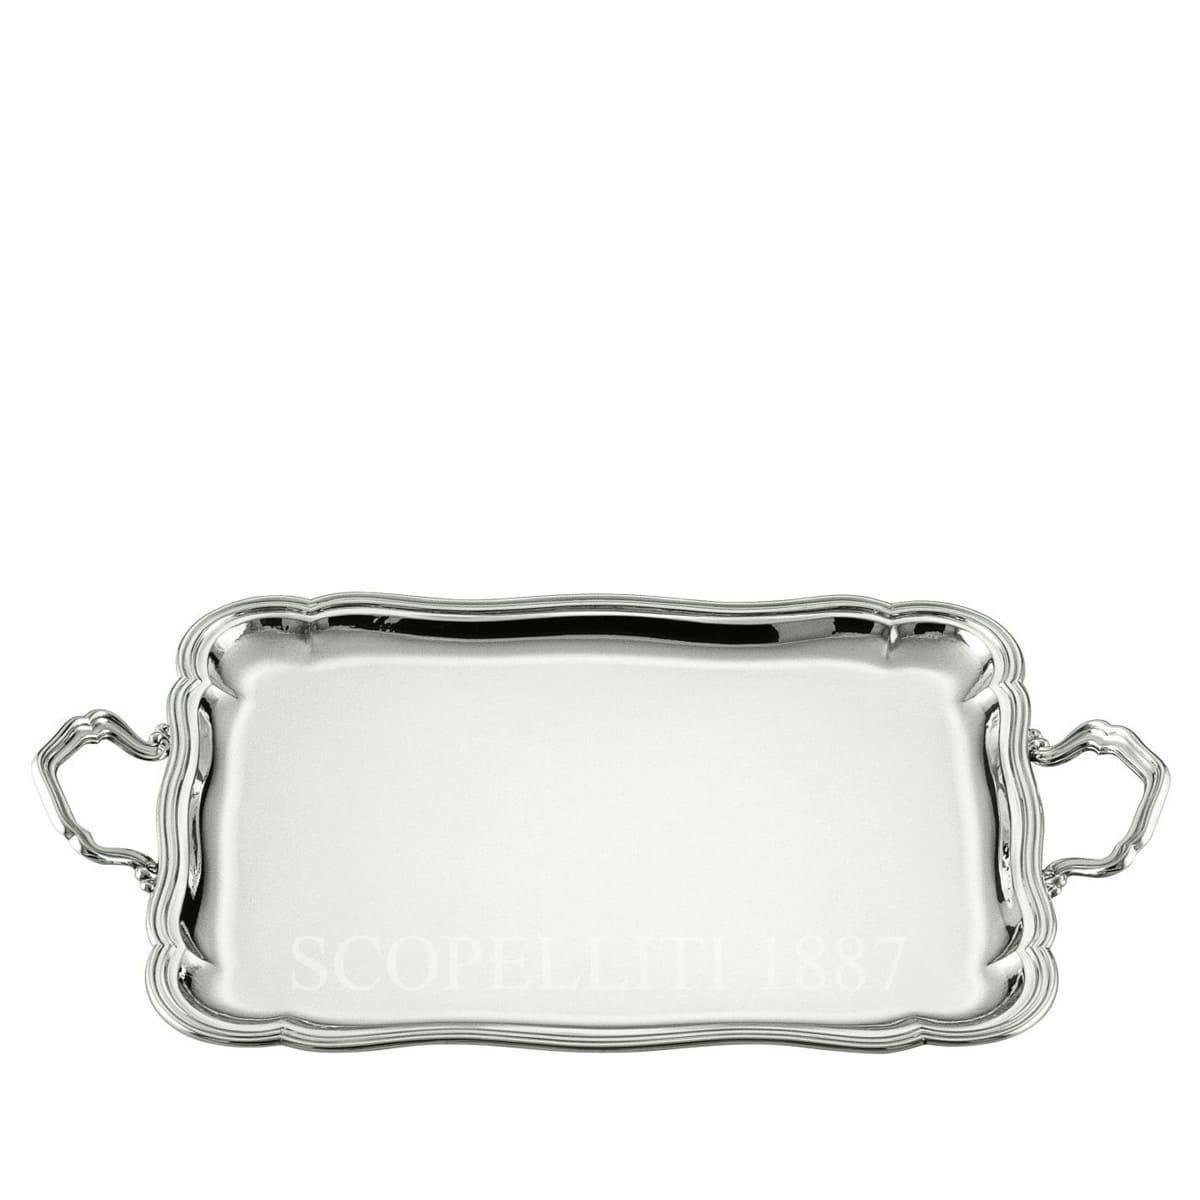 schiavon barocco real 925 sterling silver tray